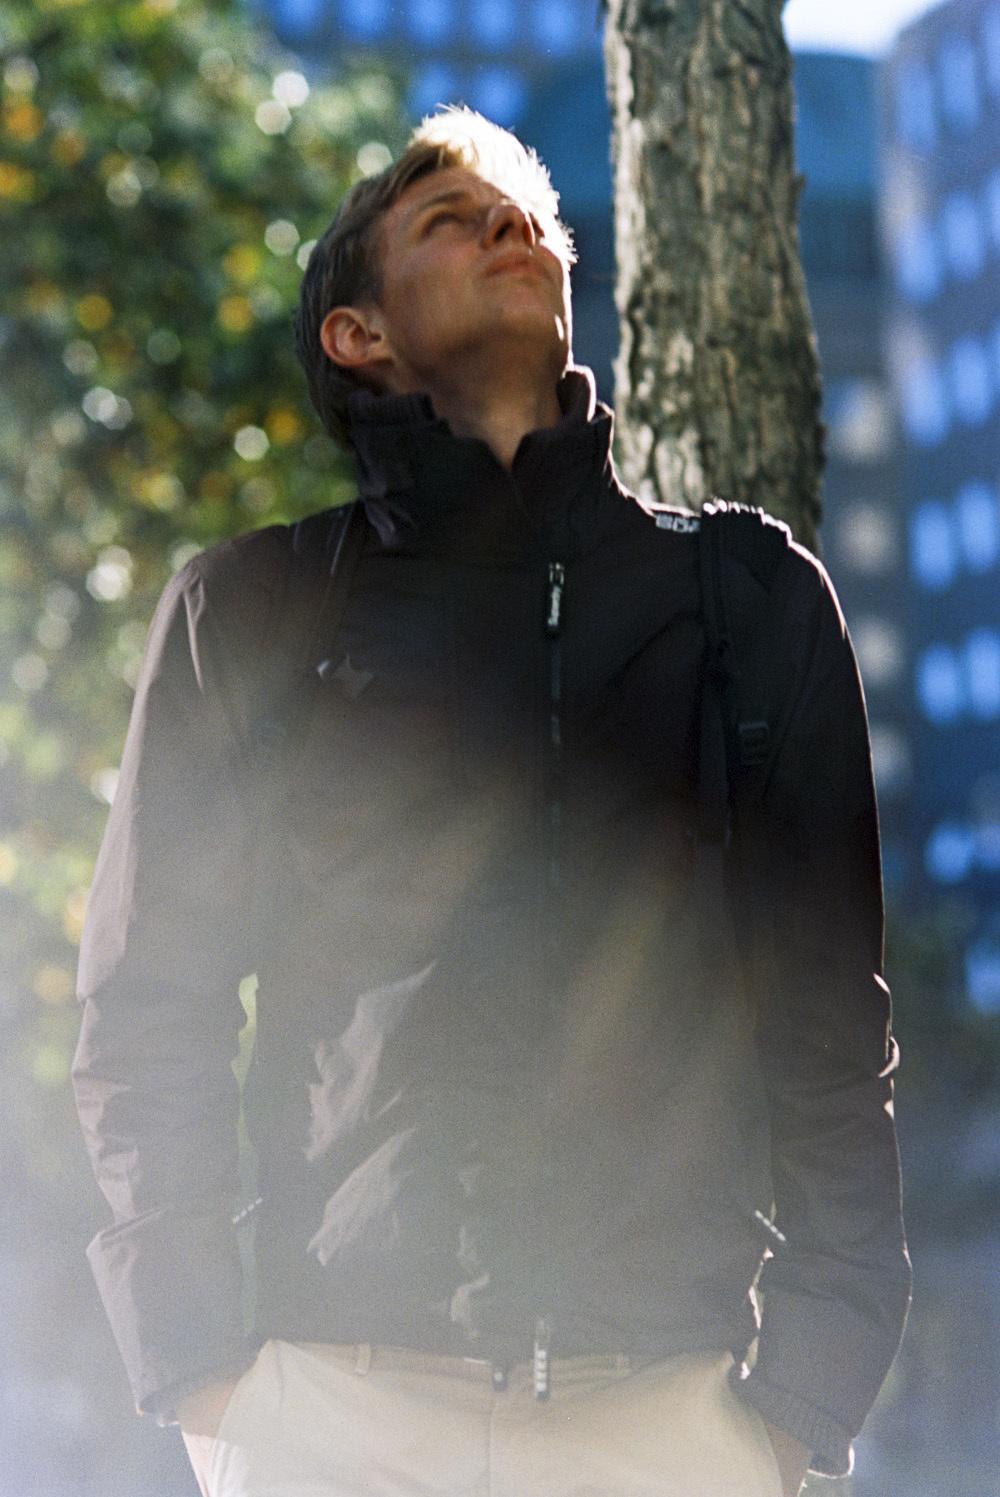 01_WTC17.jpg